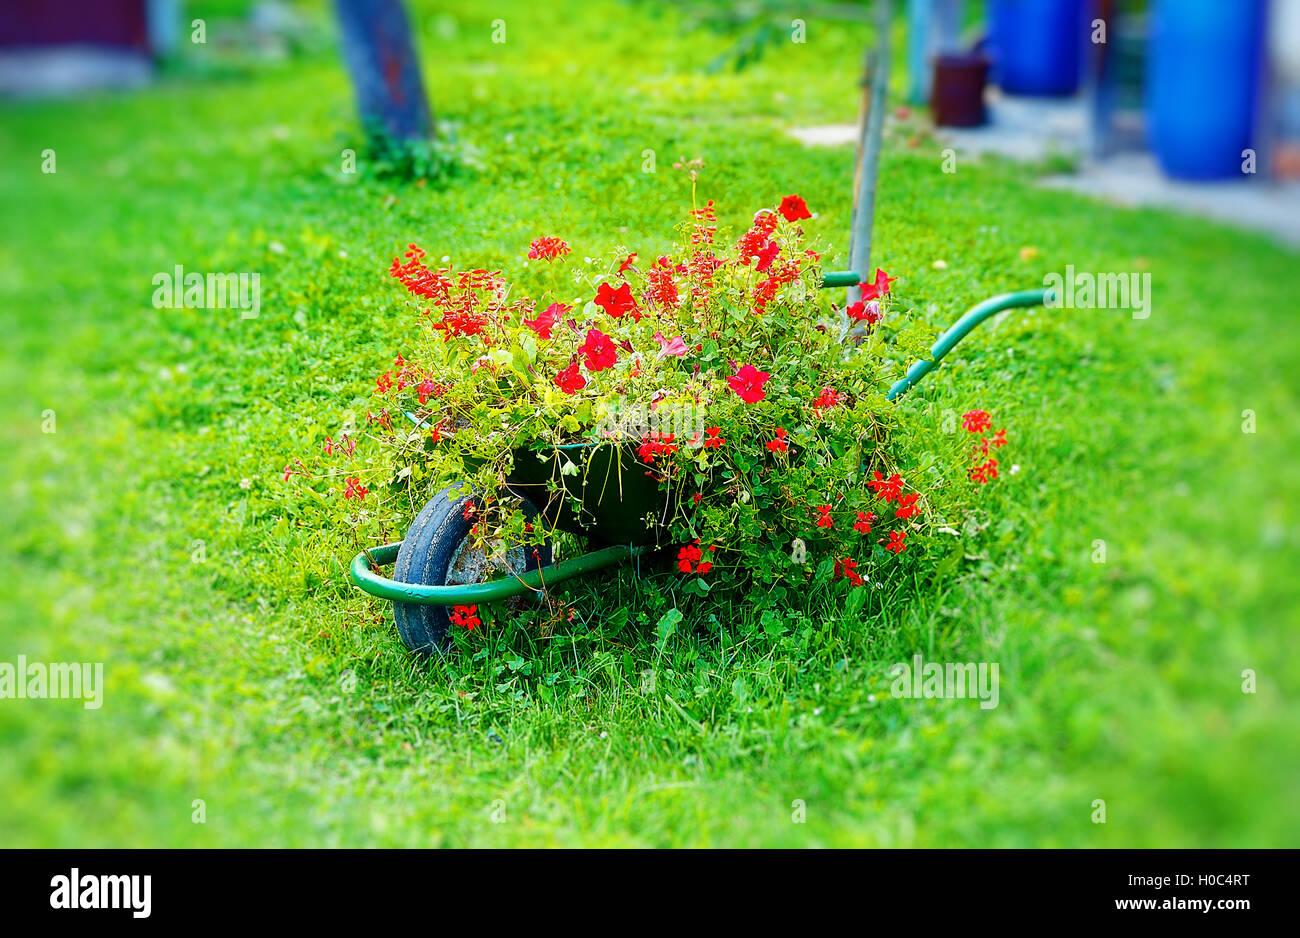 tiny decorative garden wheelbarrow full of red flowers on green lawn ...